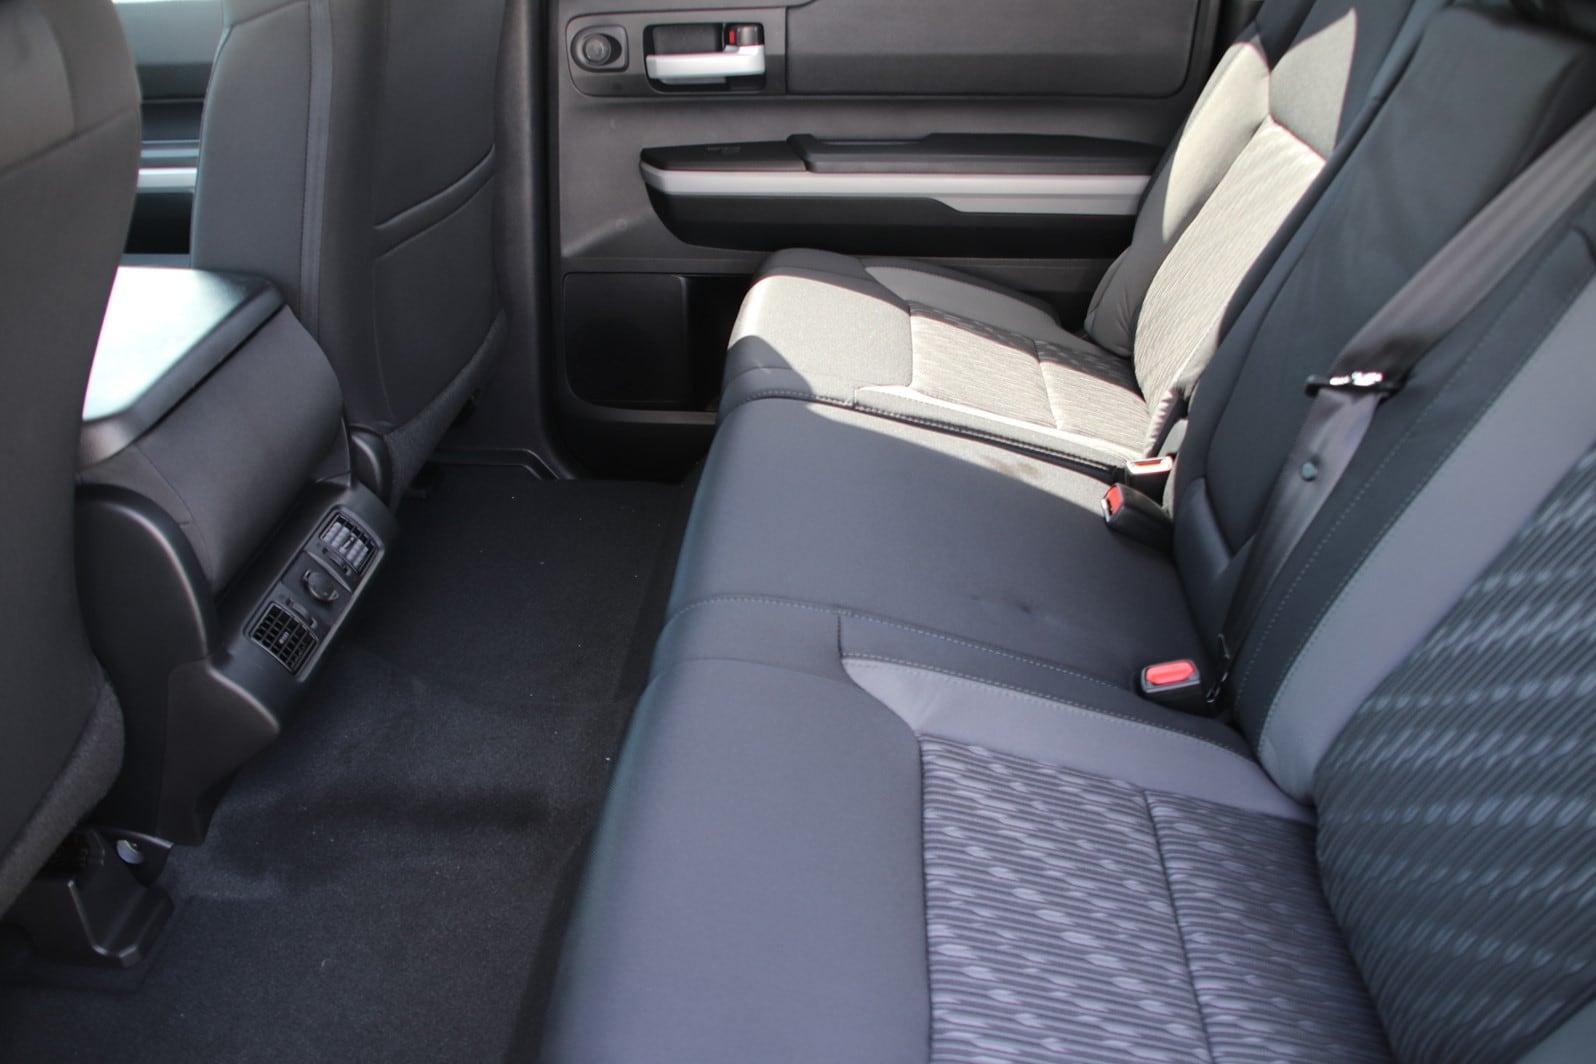 New 2019 Toyota Tundra SR5 5 7L V8 For Sale in Merced CA